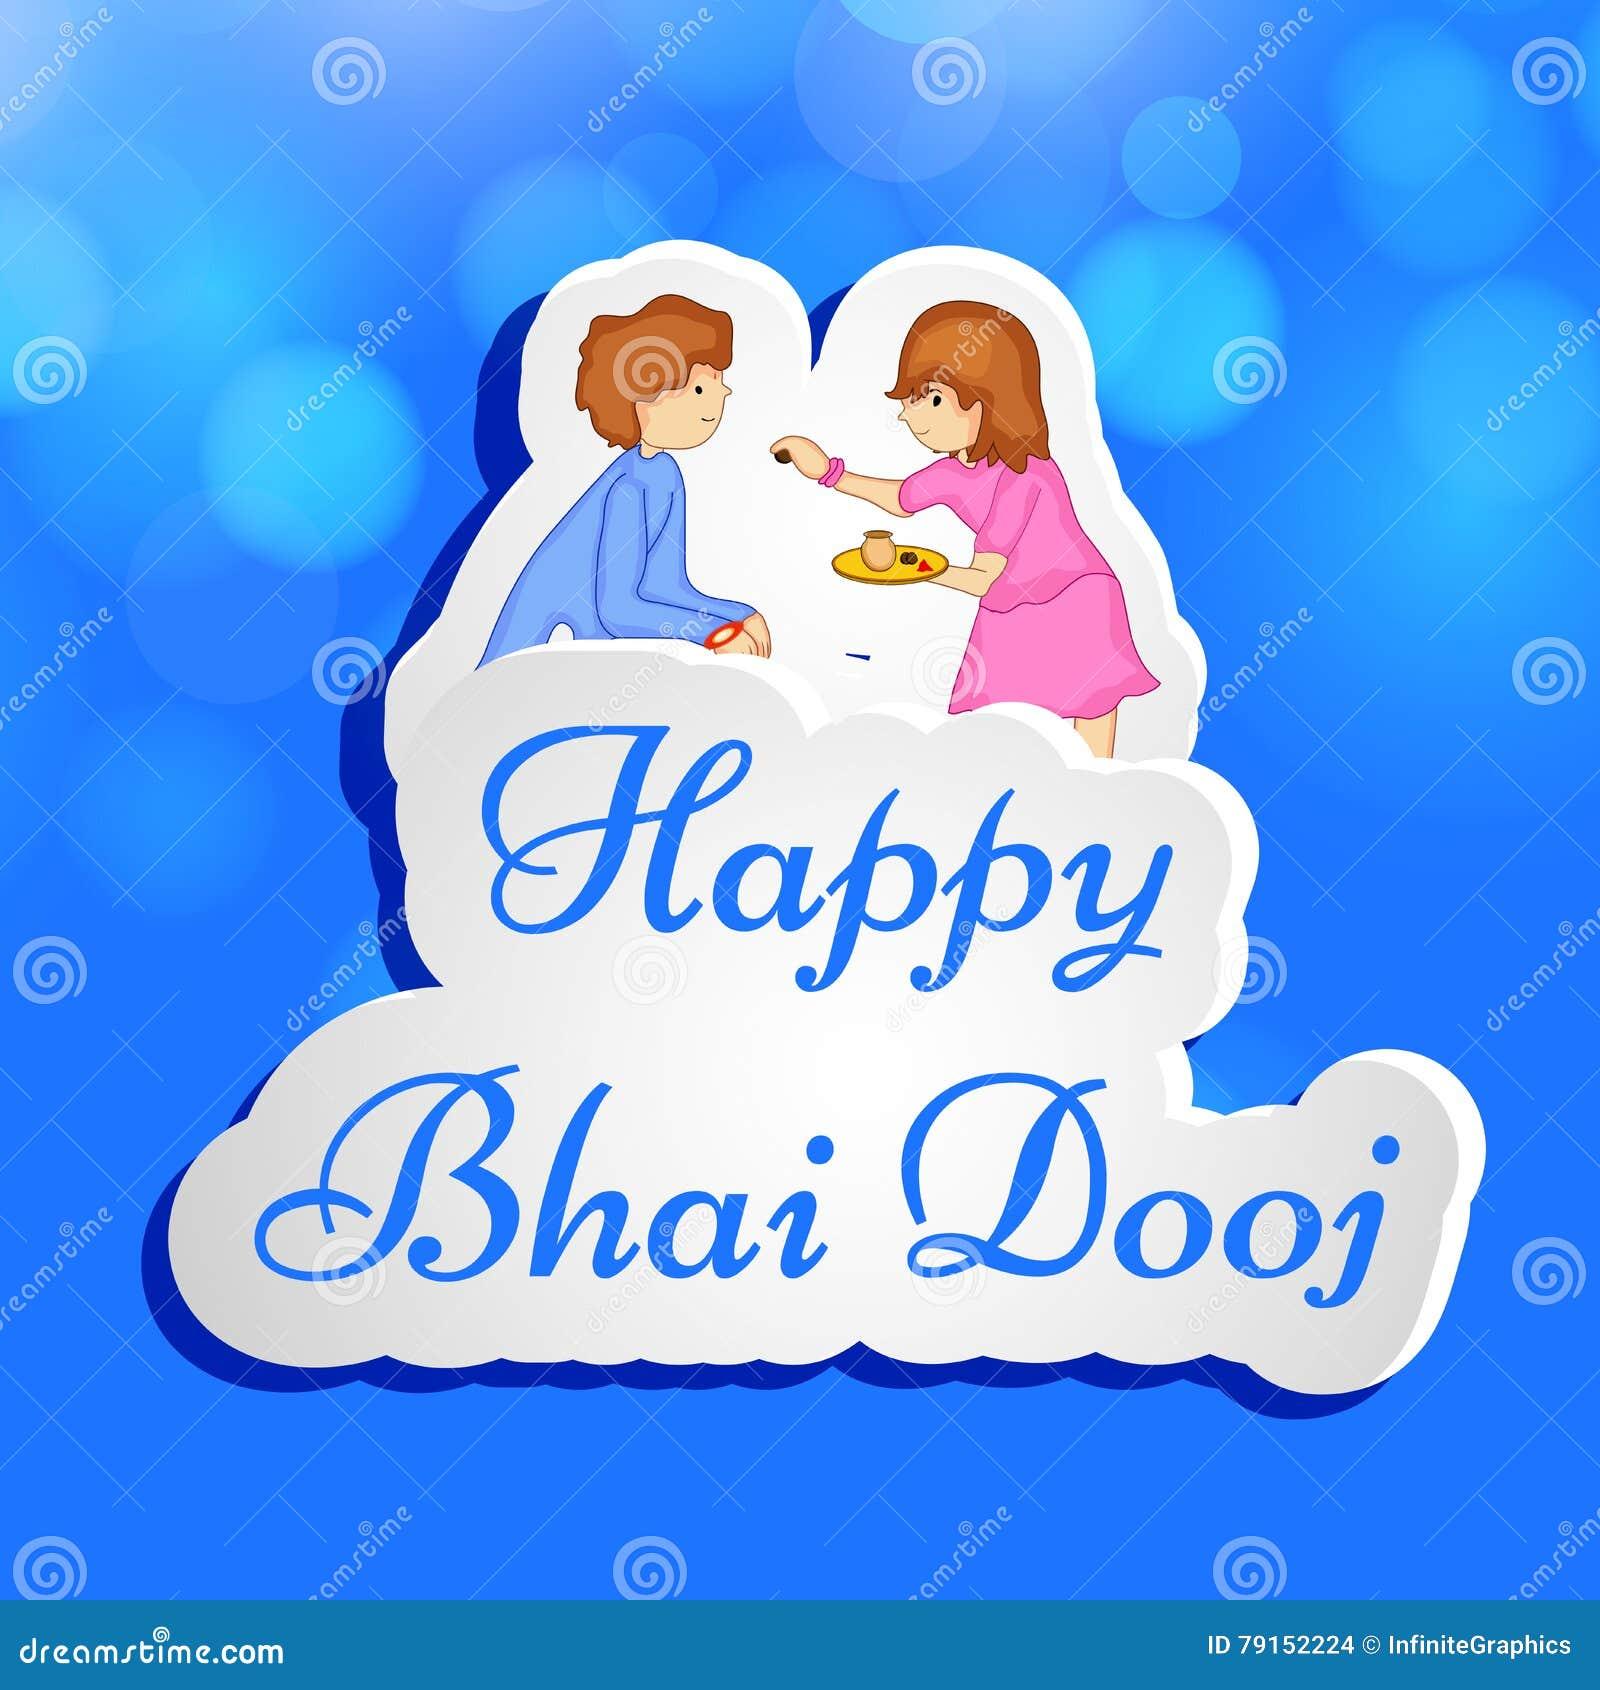 Bhai Dooj Background Stock Vector Illustration Of Design 79152224